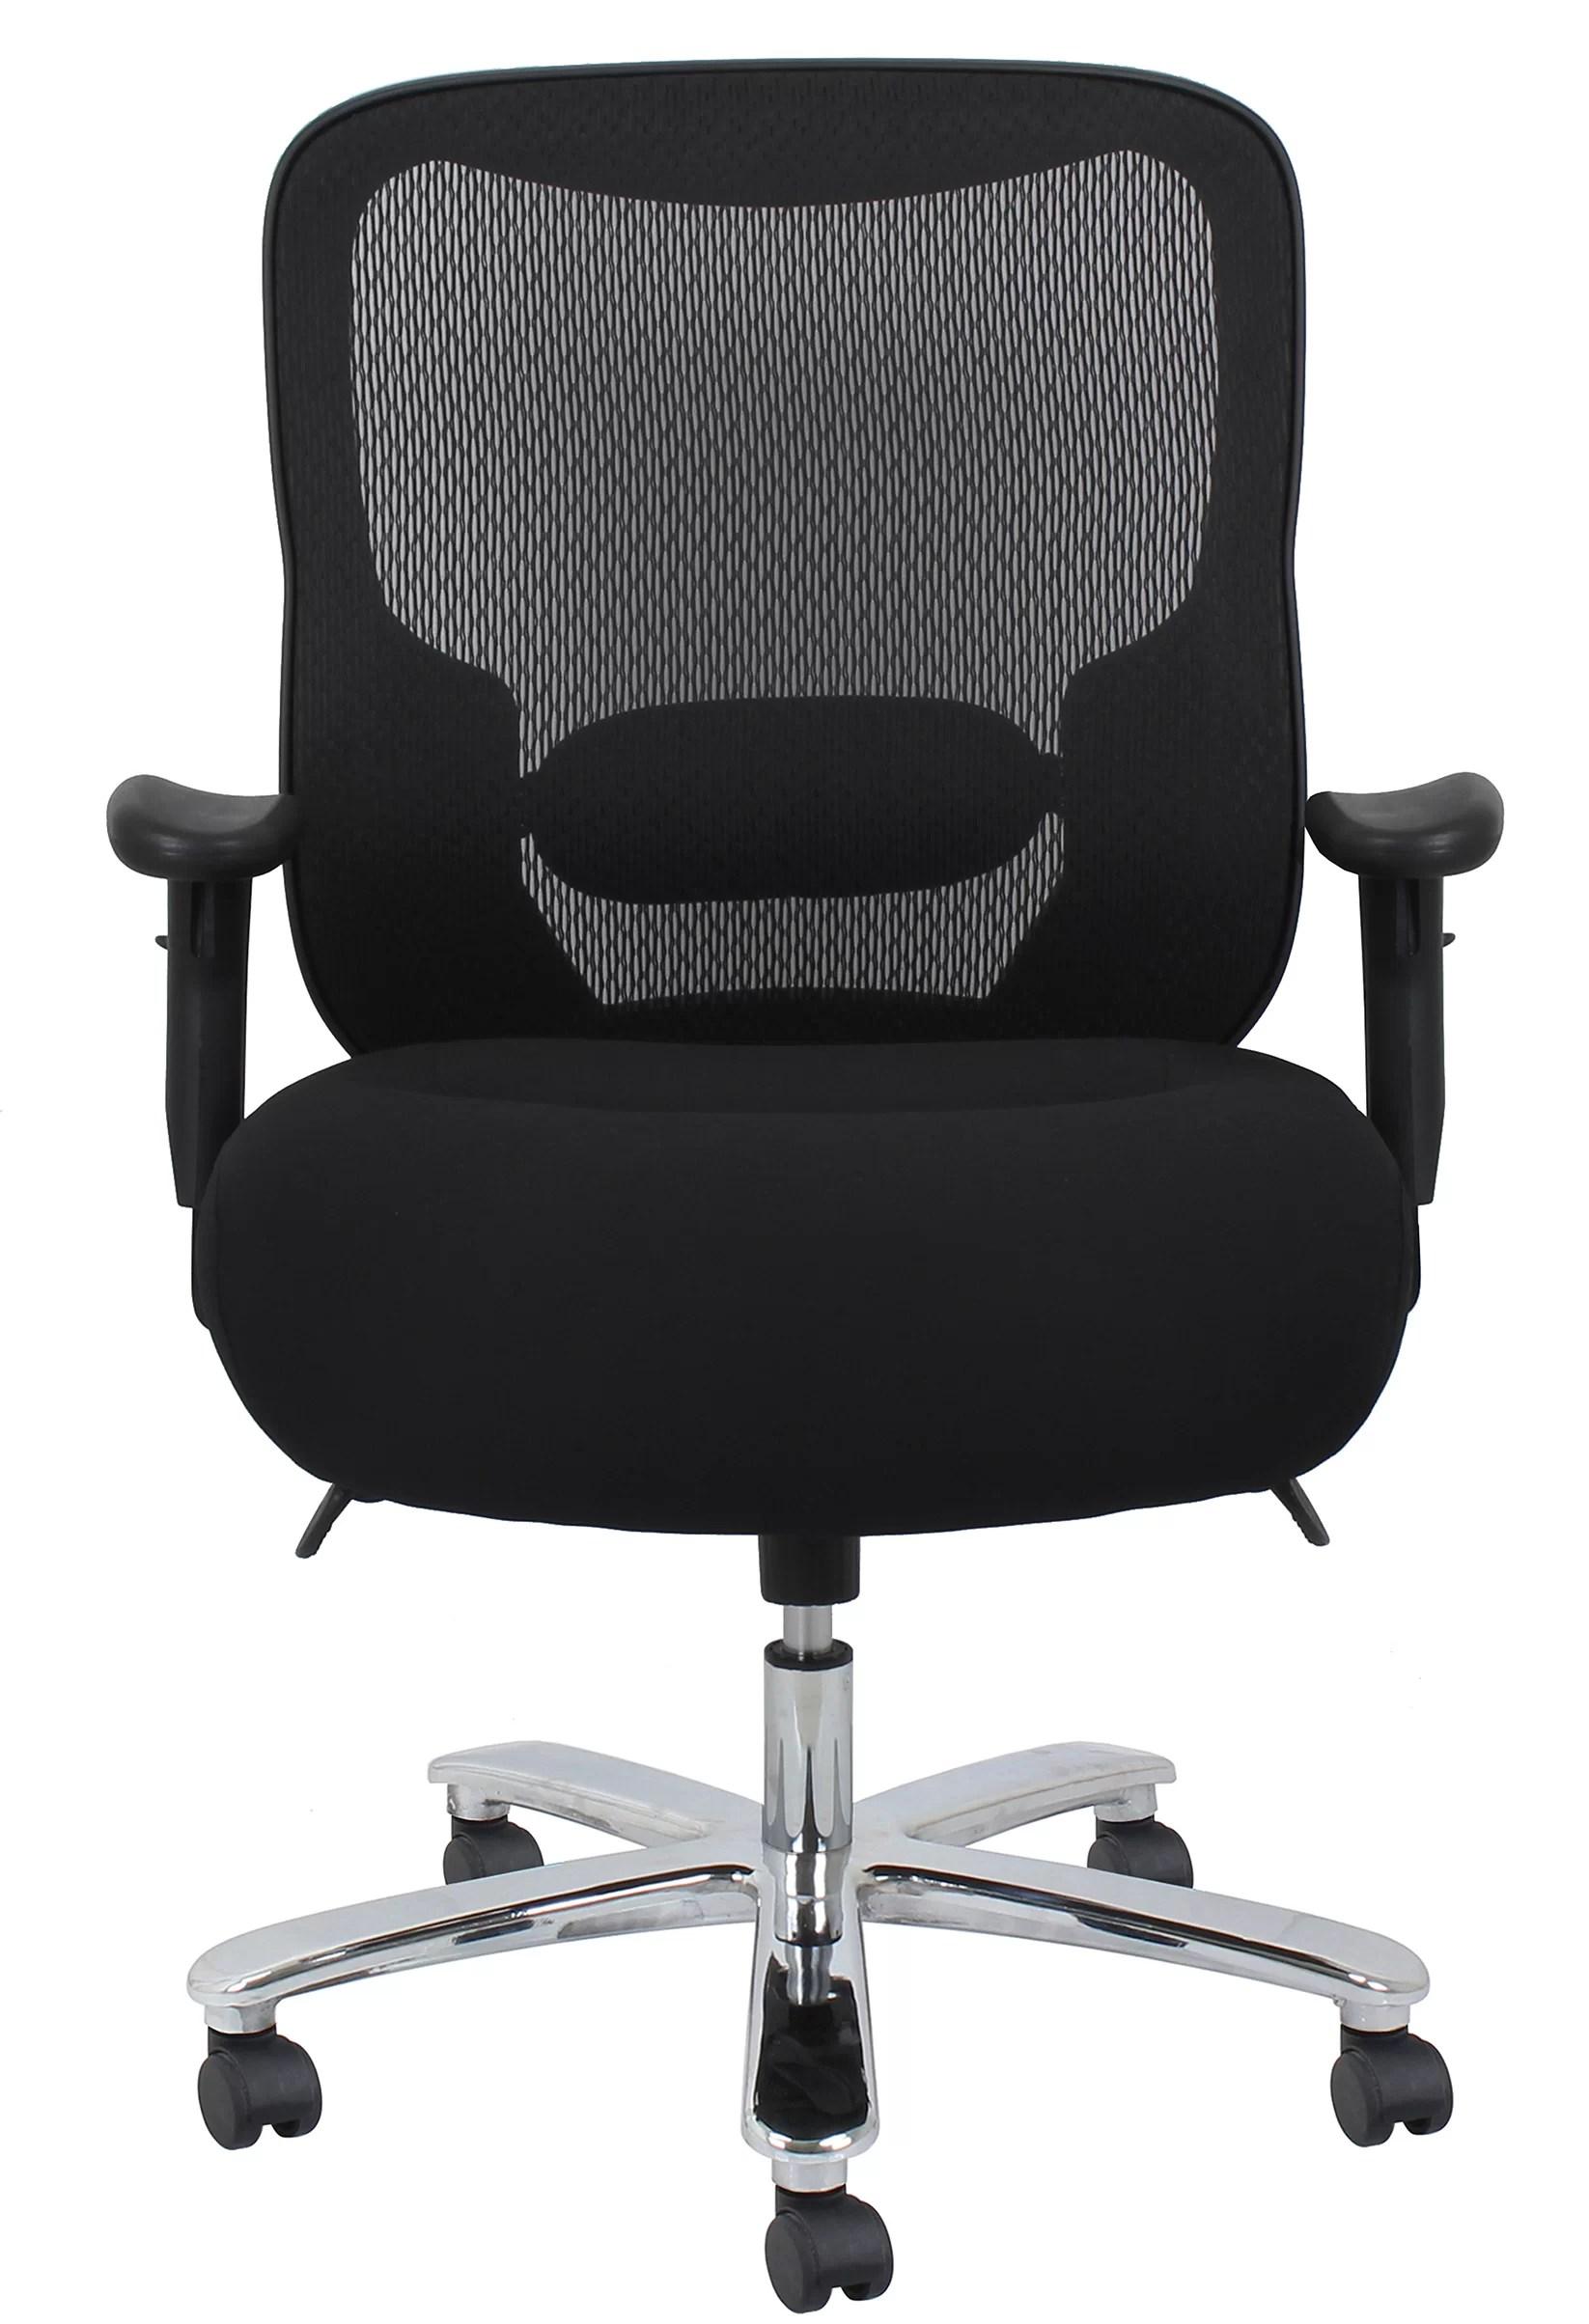 office chair high back soccer ball bean bag symple stuff gilliland mesh reviews wayfair